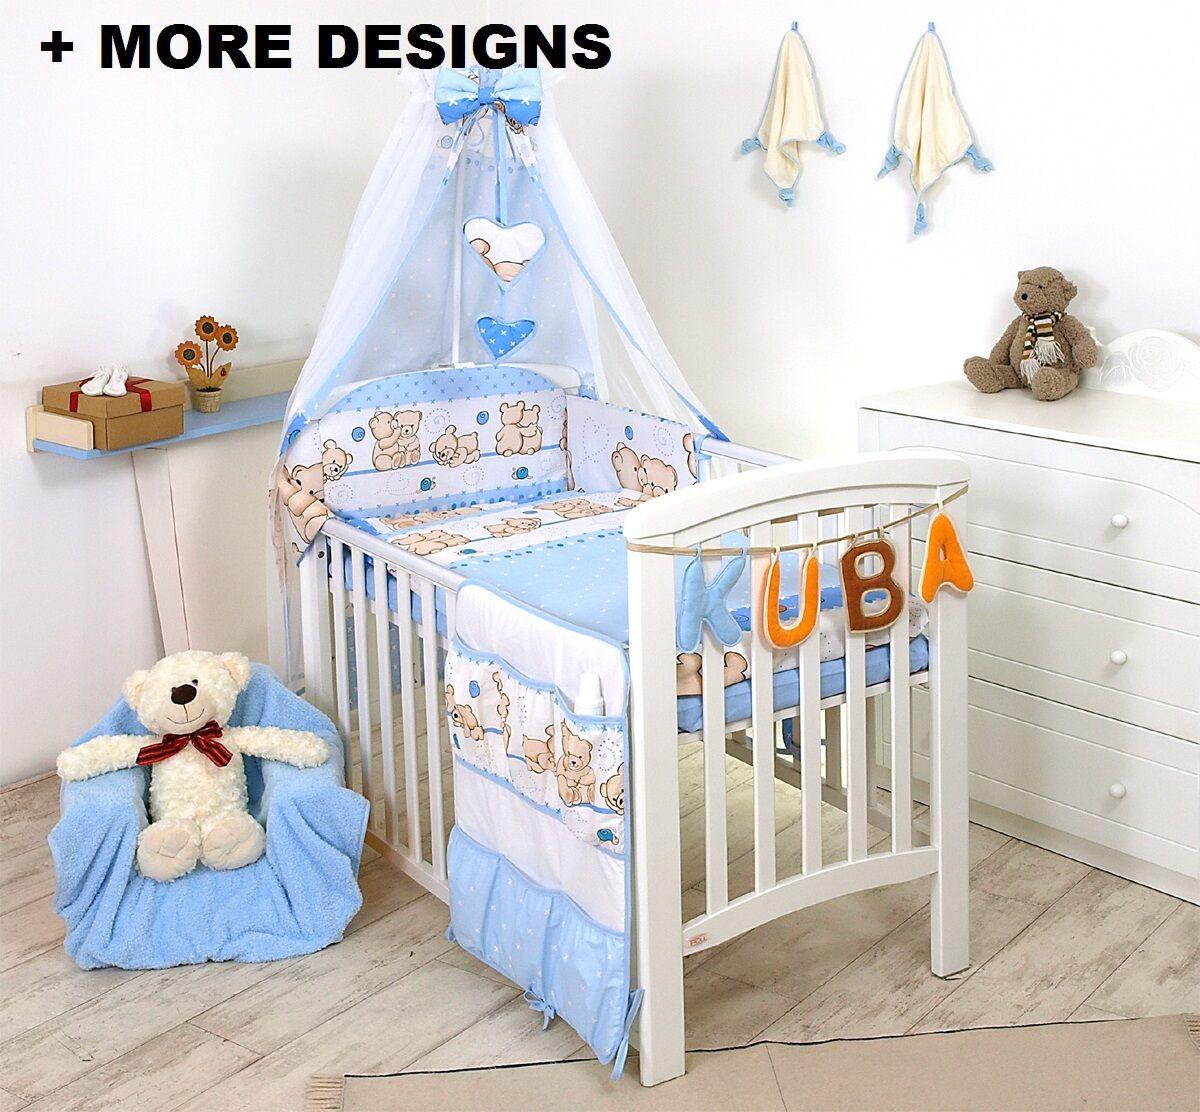 Vêtements garçons (0-24 mois) Dogy Dog Baby Body babyanzug rouge coton éponge garçon Taille 56 62 68